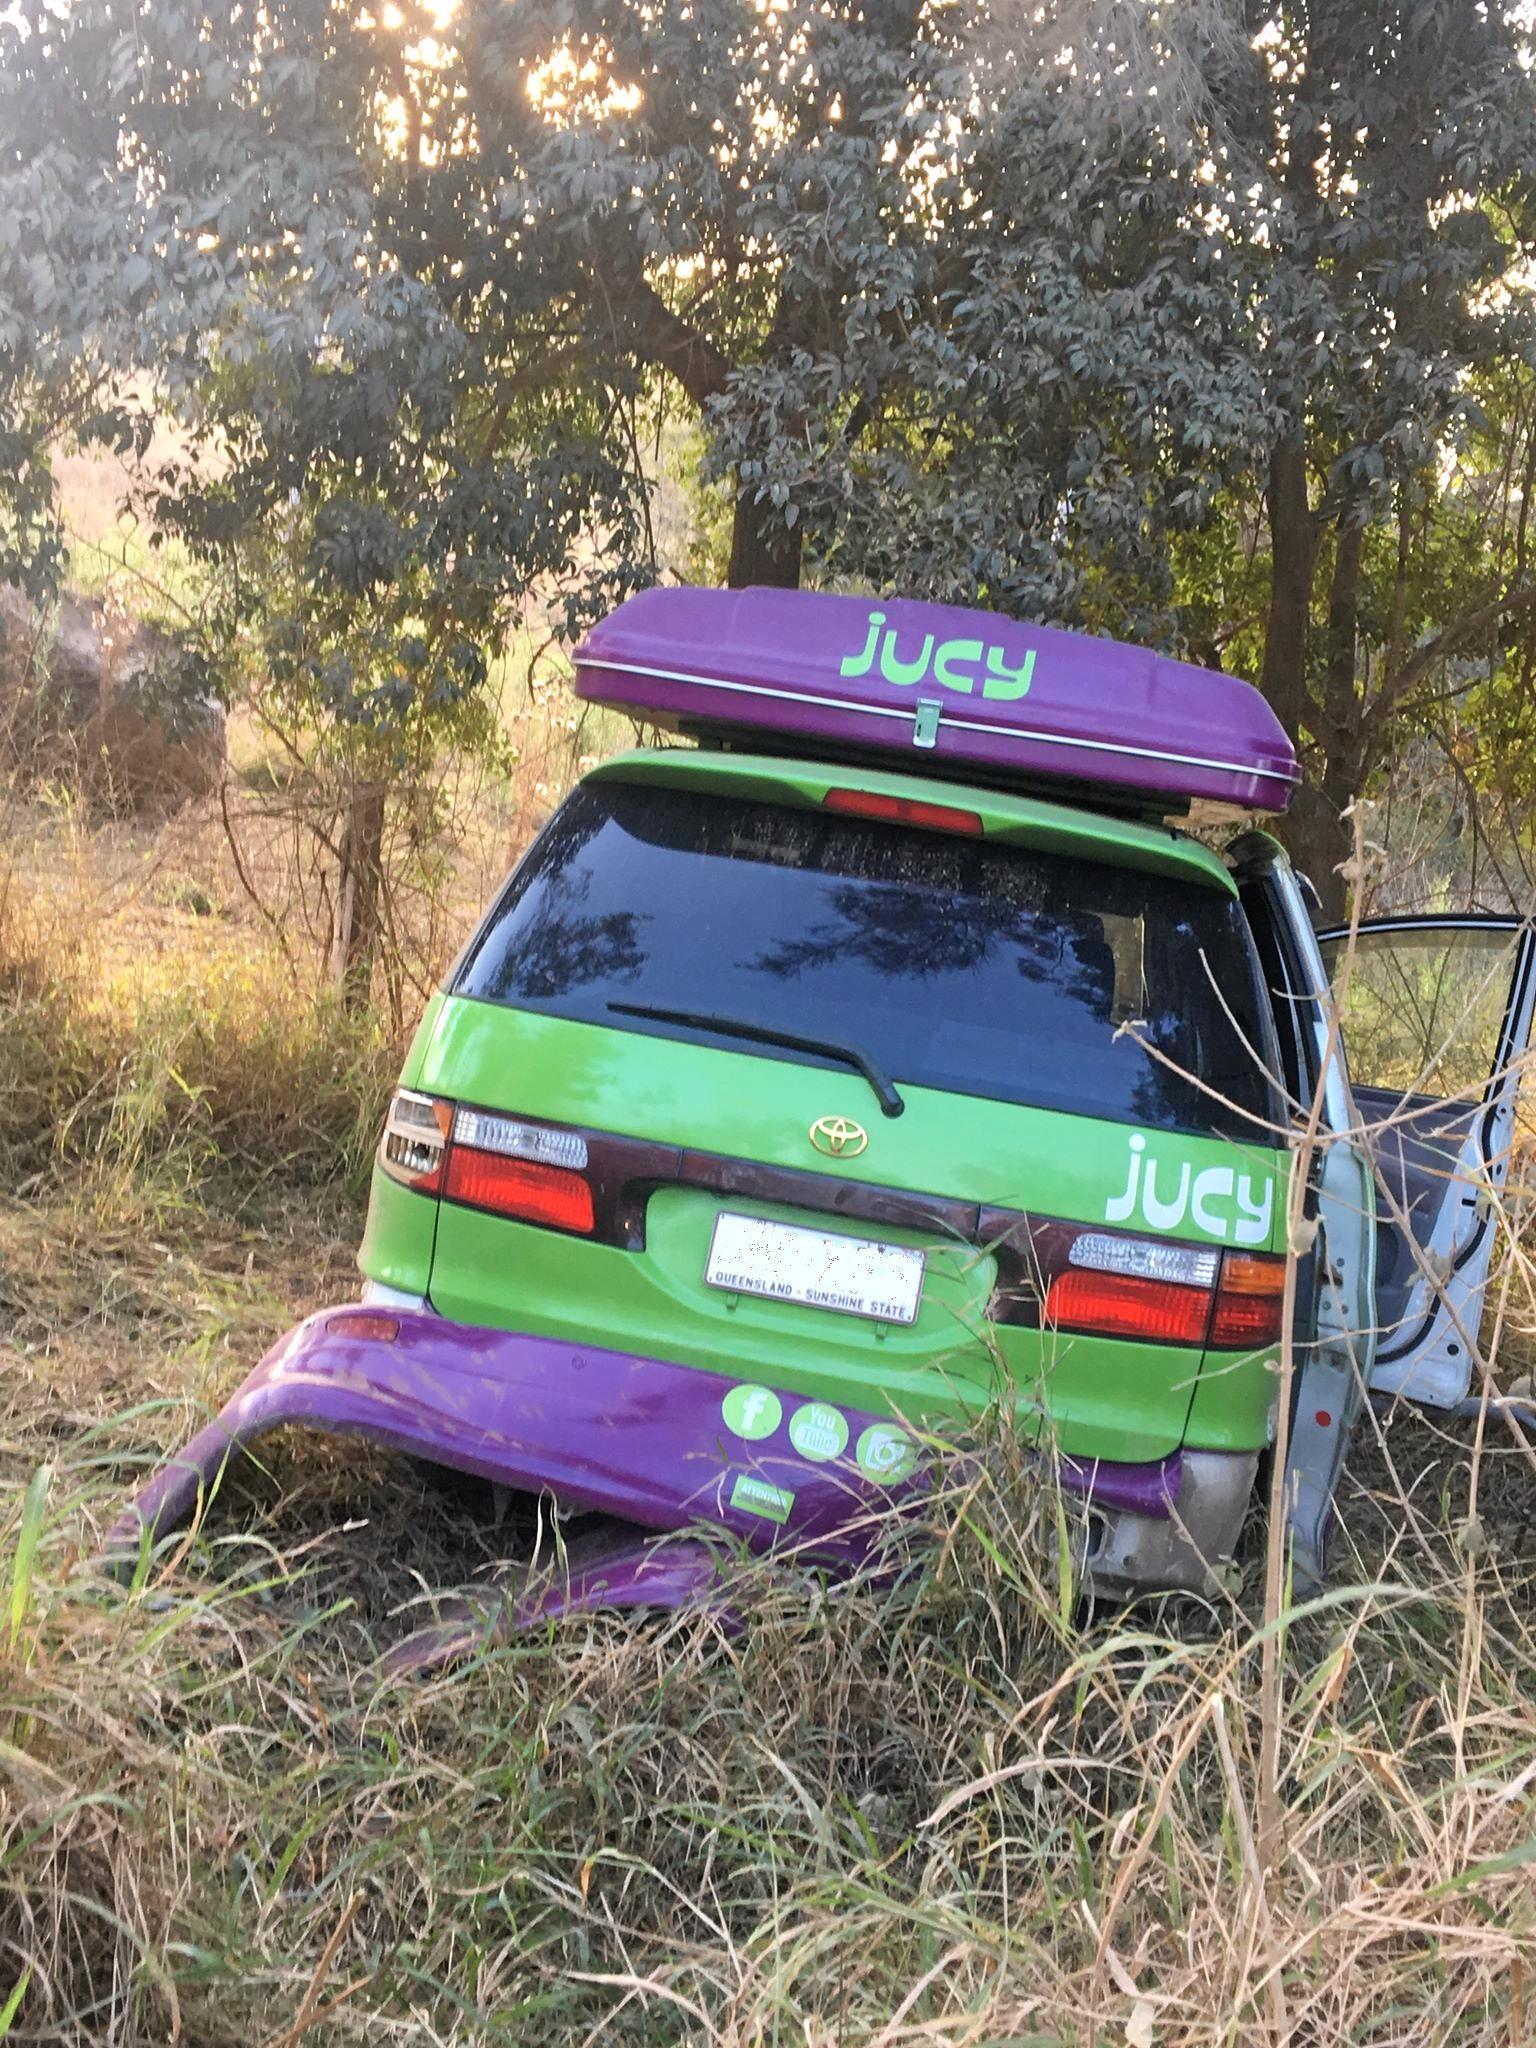 Jucy van crash north of Woolooga.